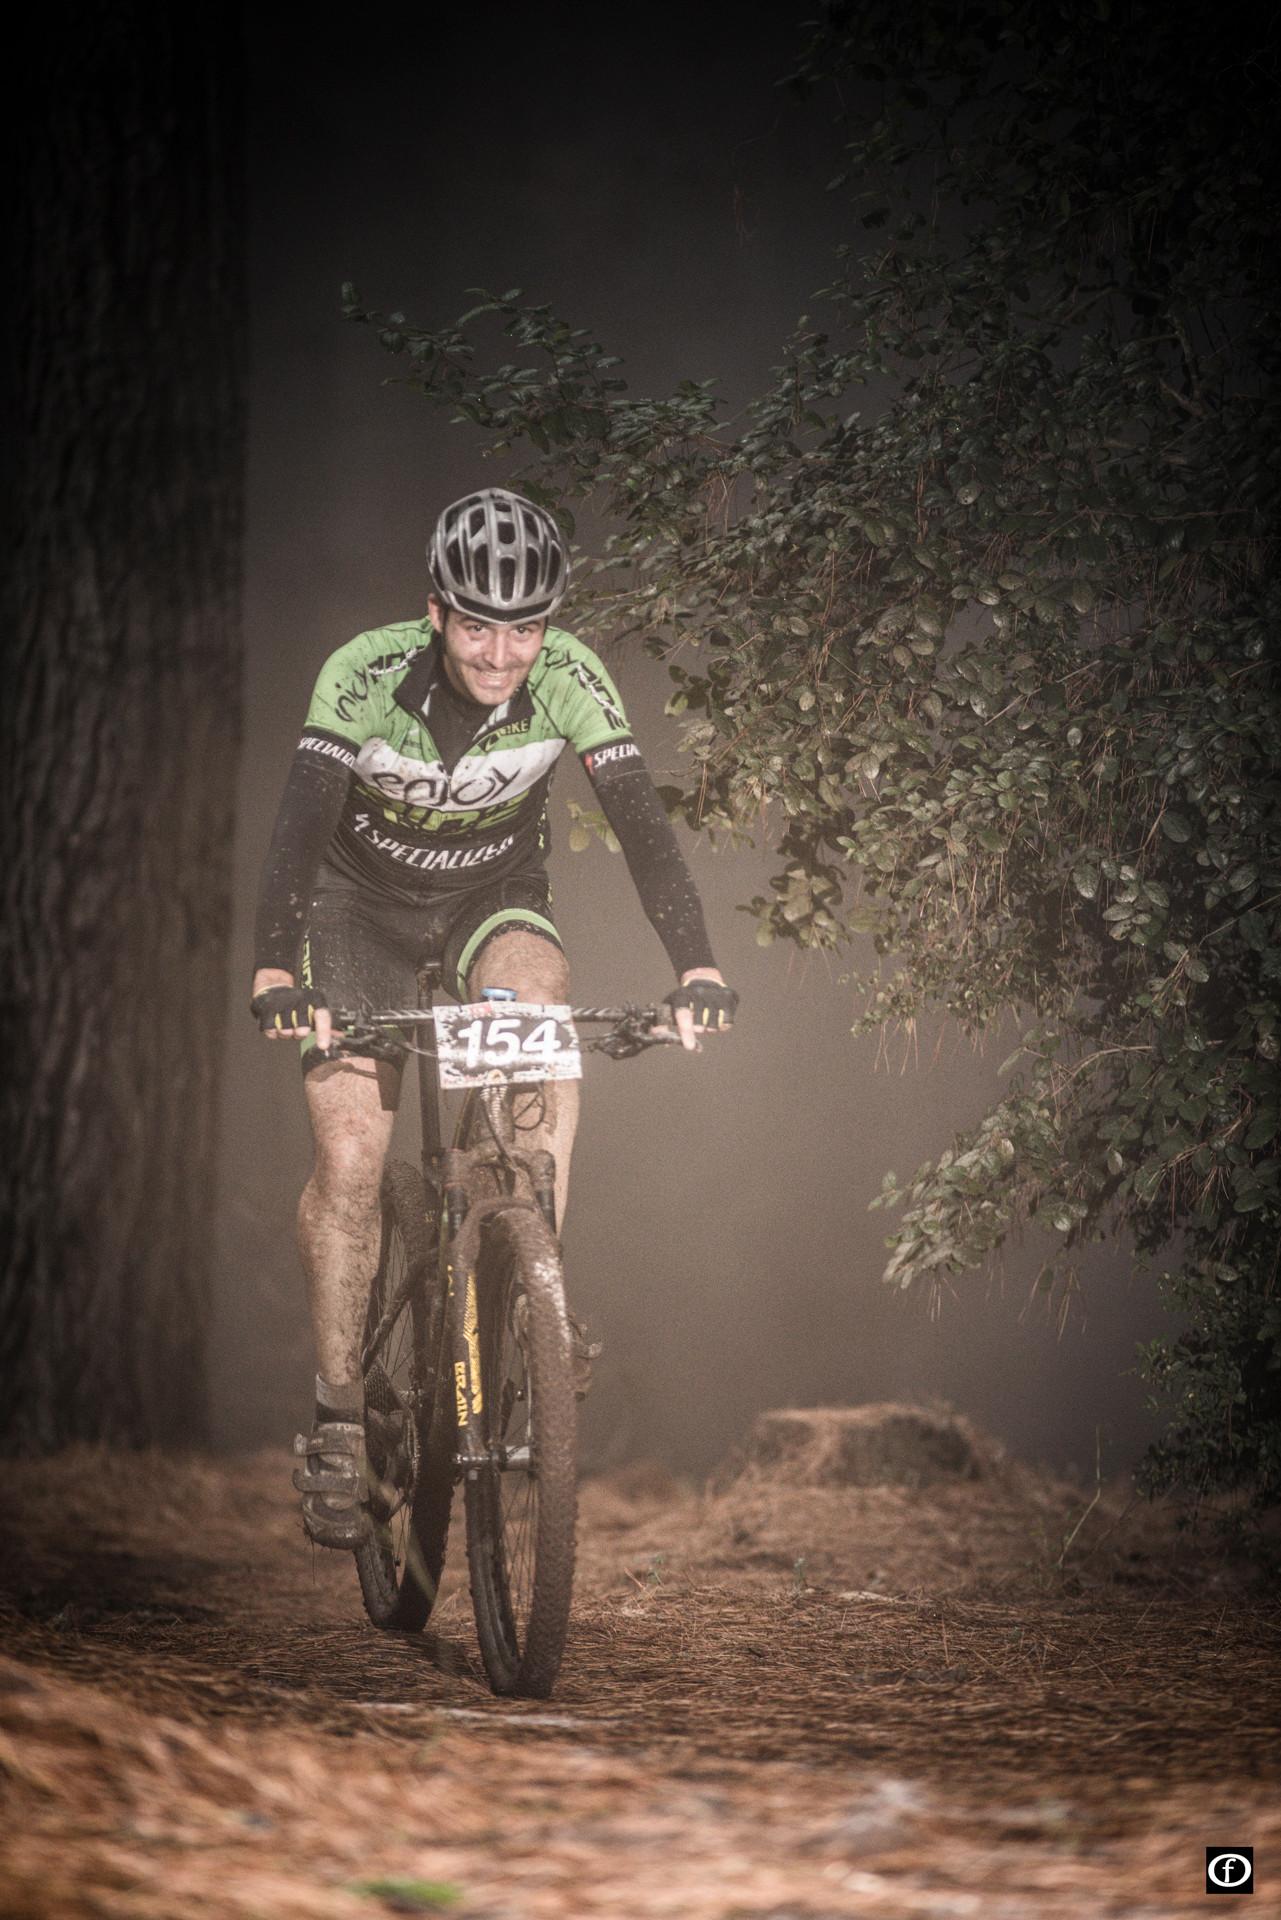 2015-05-17-Ciclismo Enduro-42.jpg